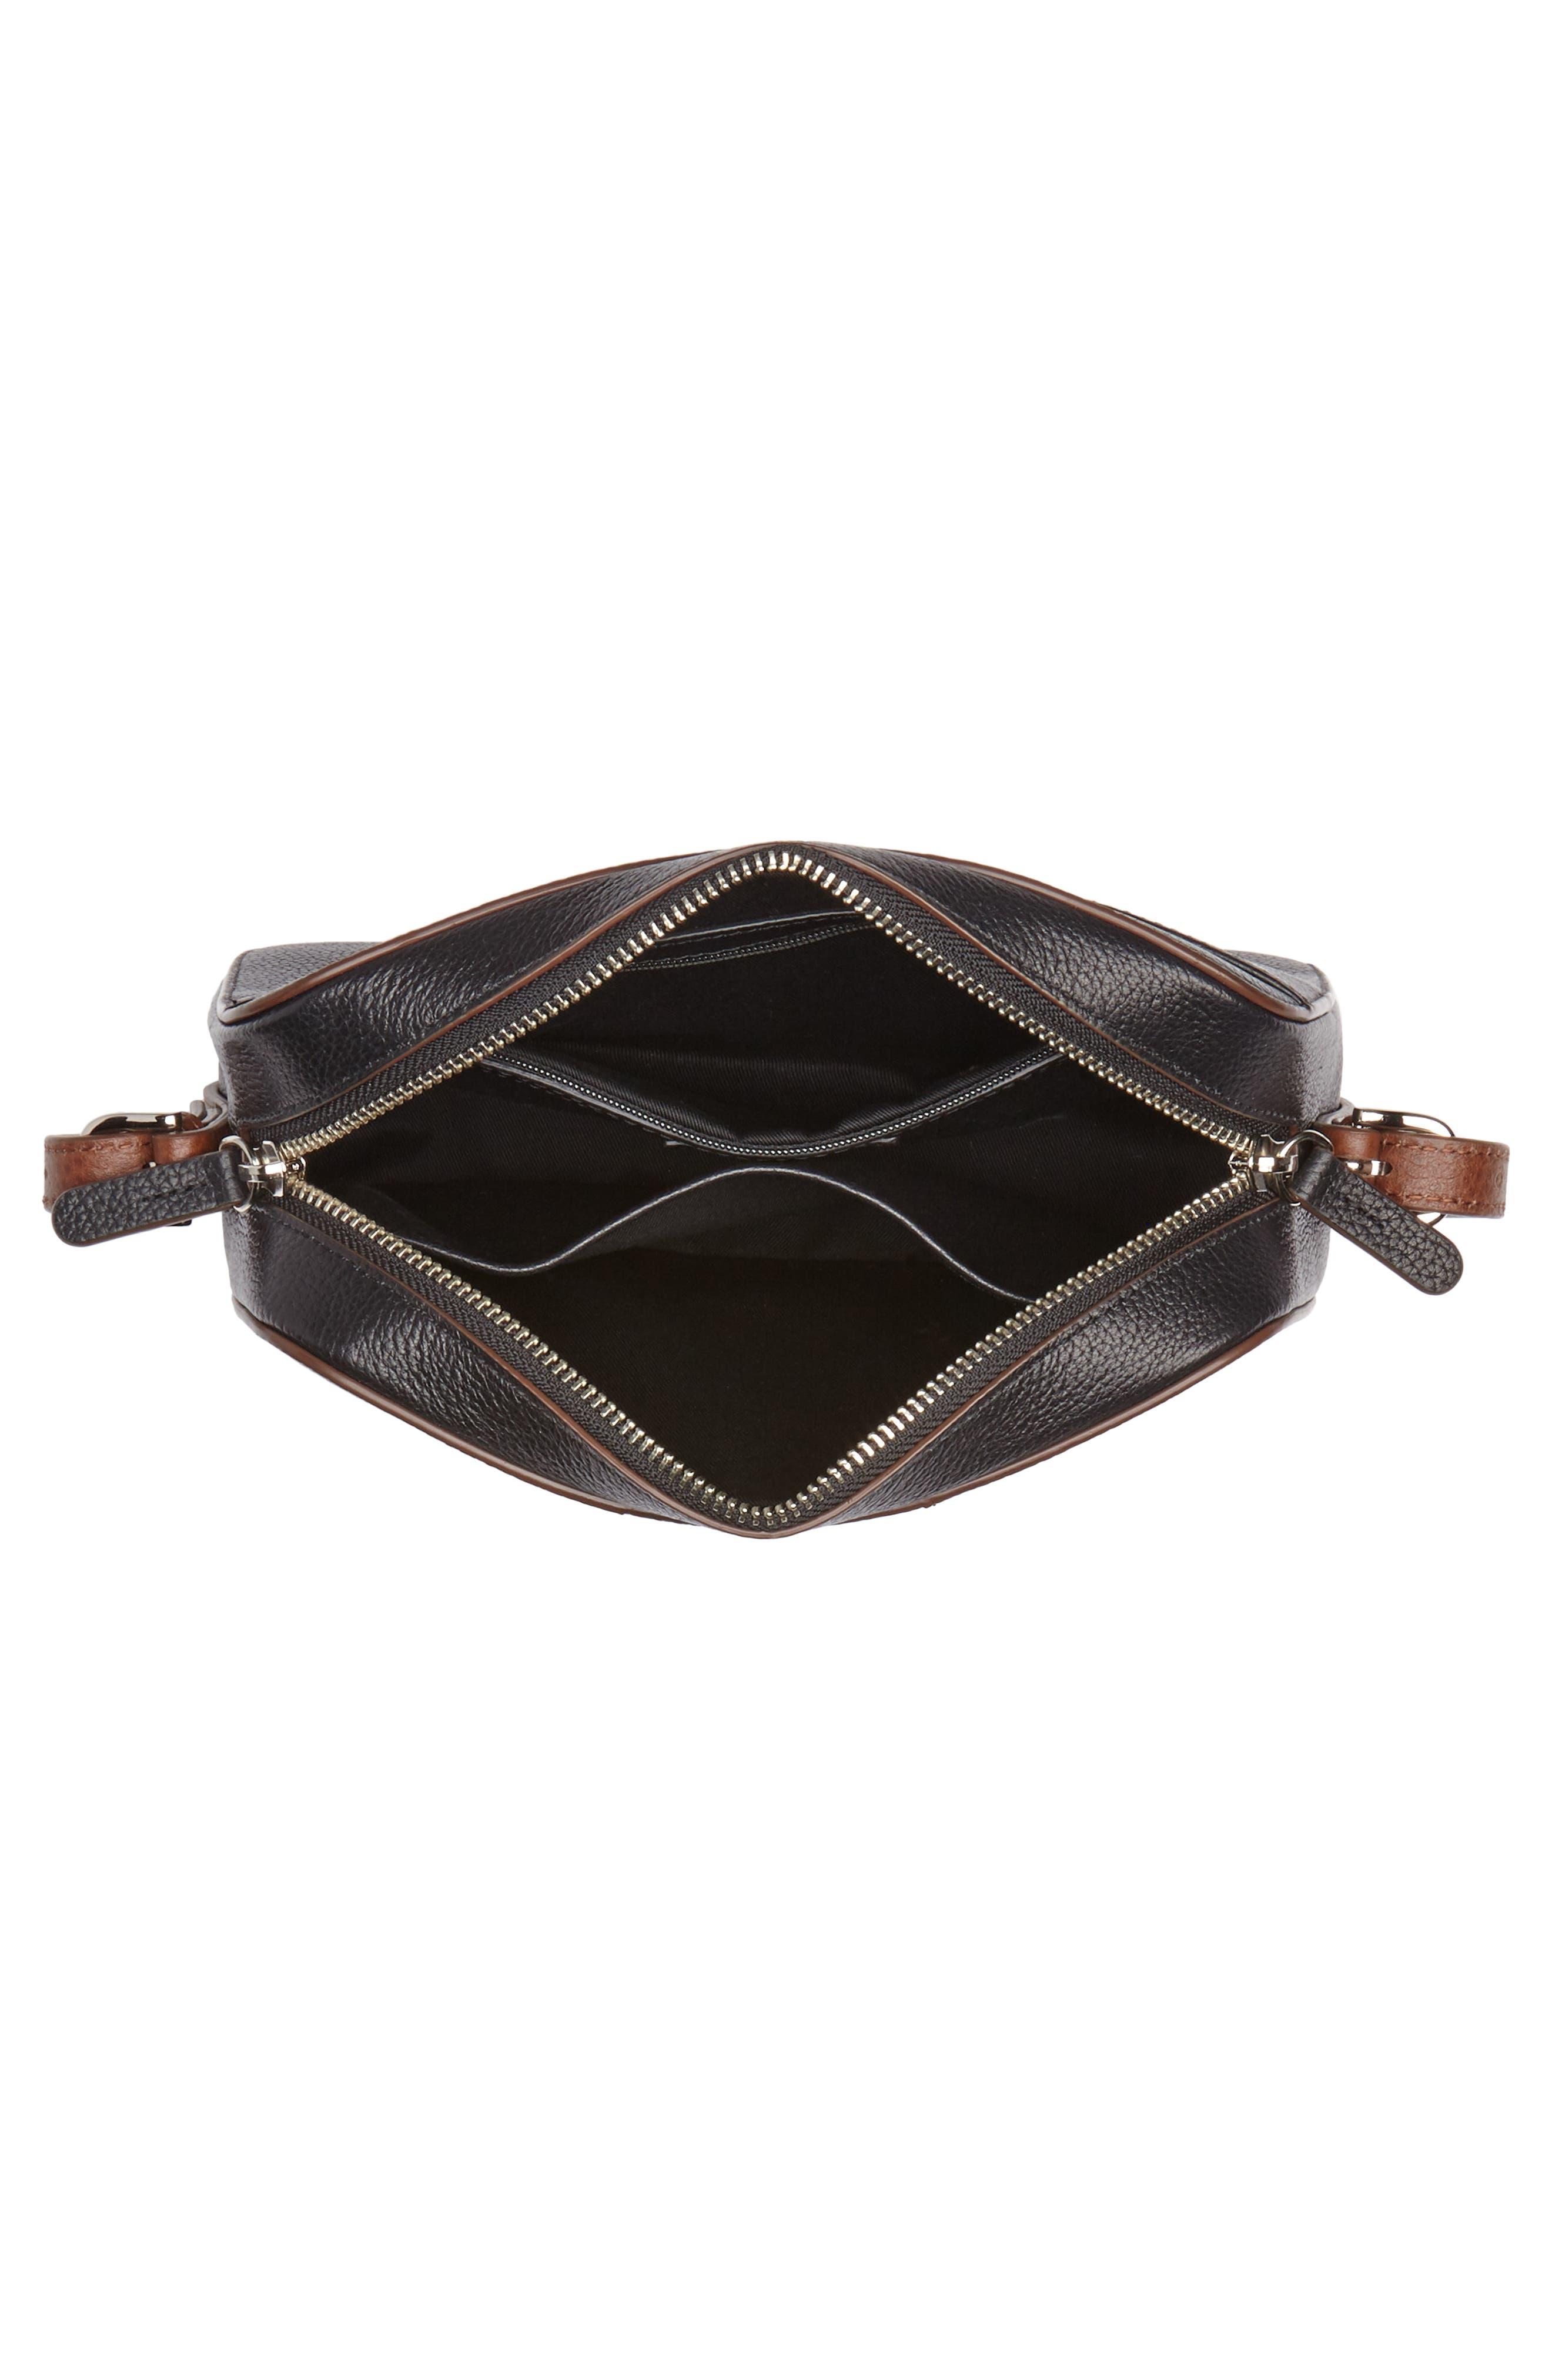 Brayden Leather Crossbody Camera Bag,                             Alternate thumbnail 17, color,